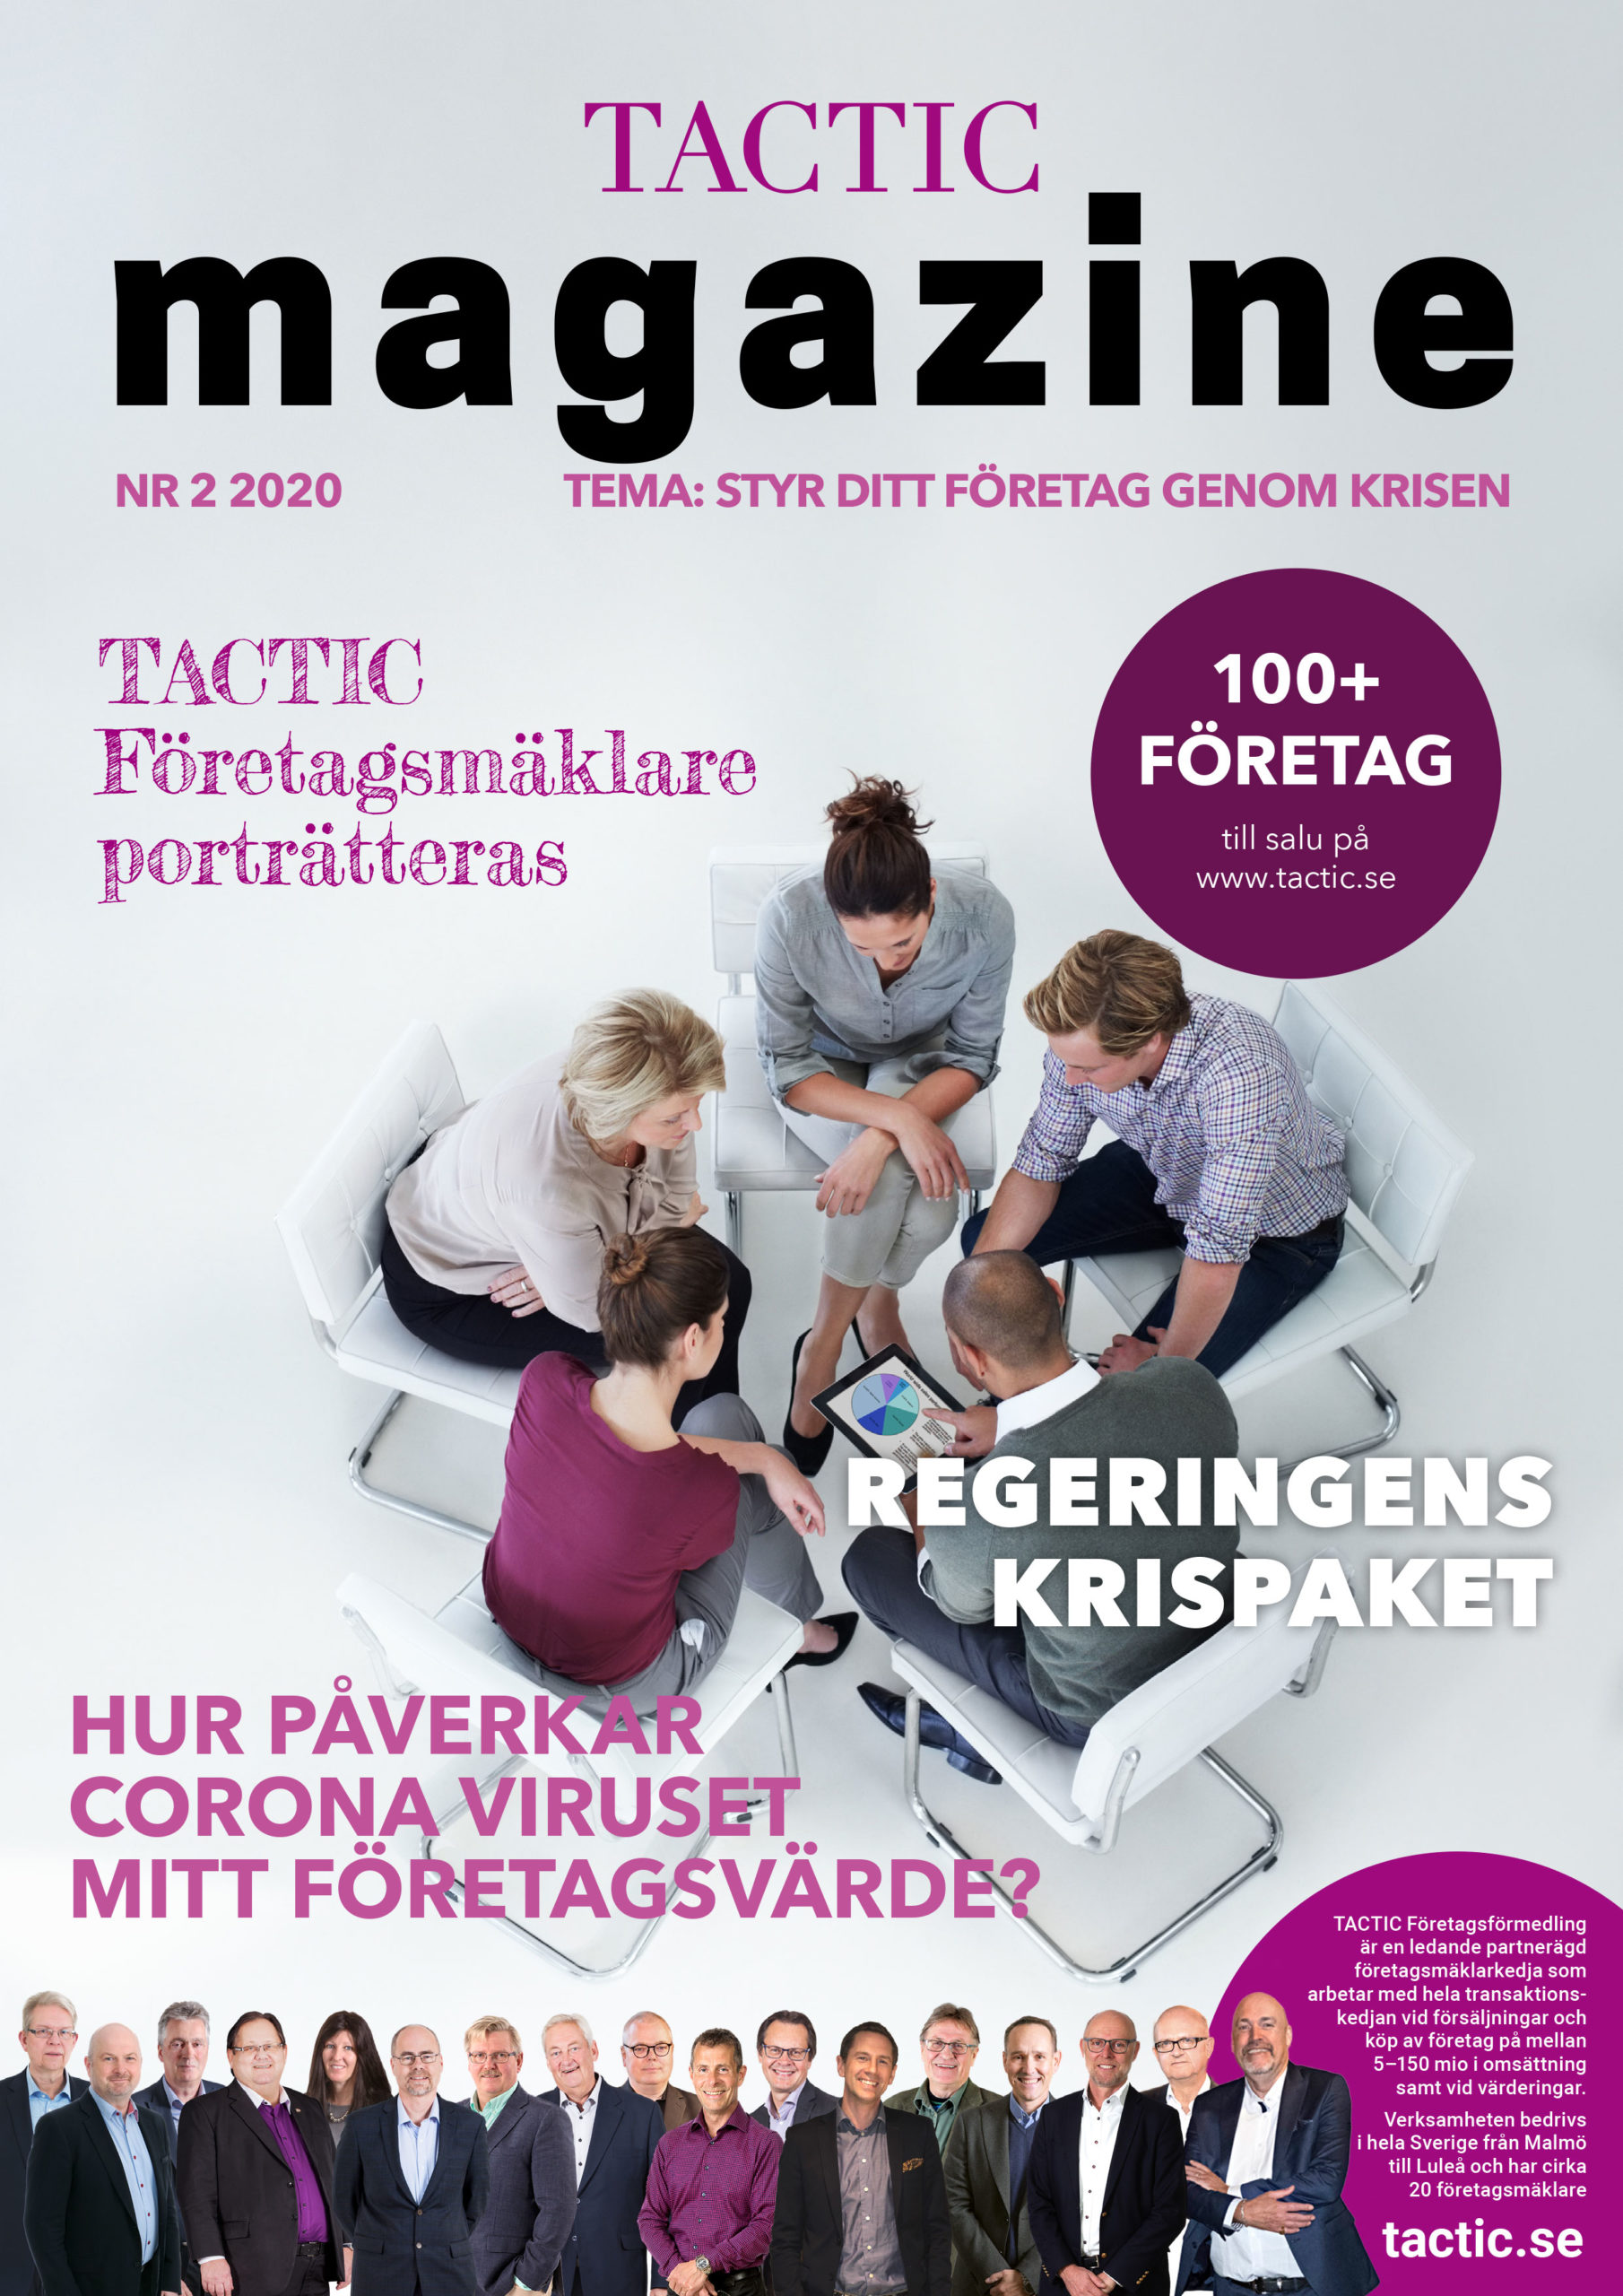 Tactic Magazine Nr 2 2020